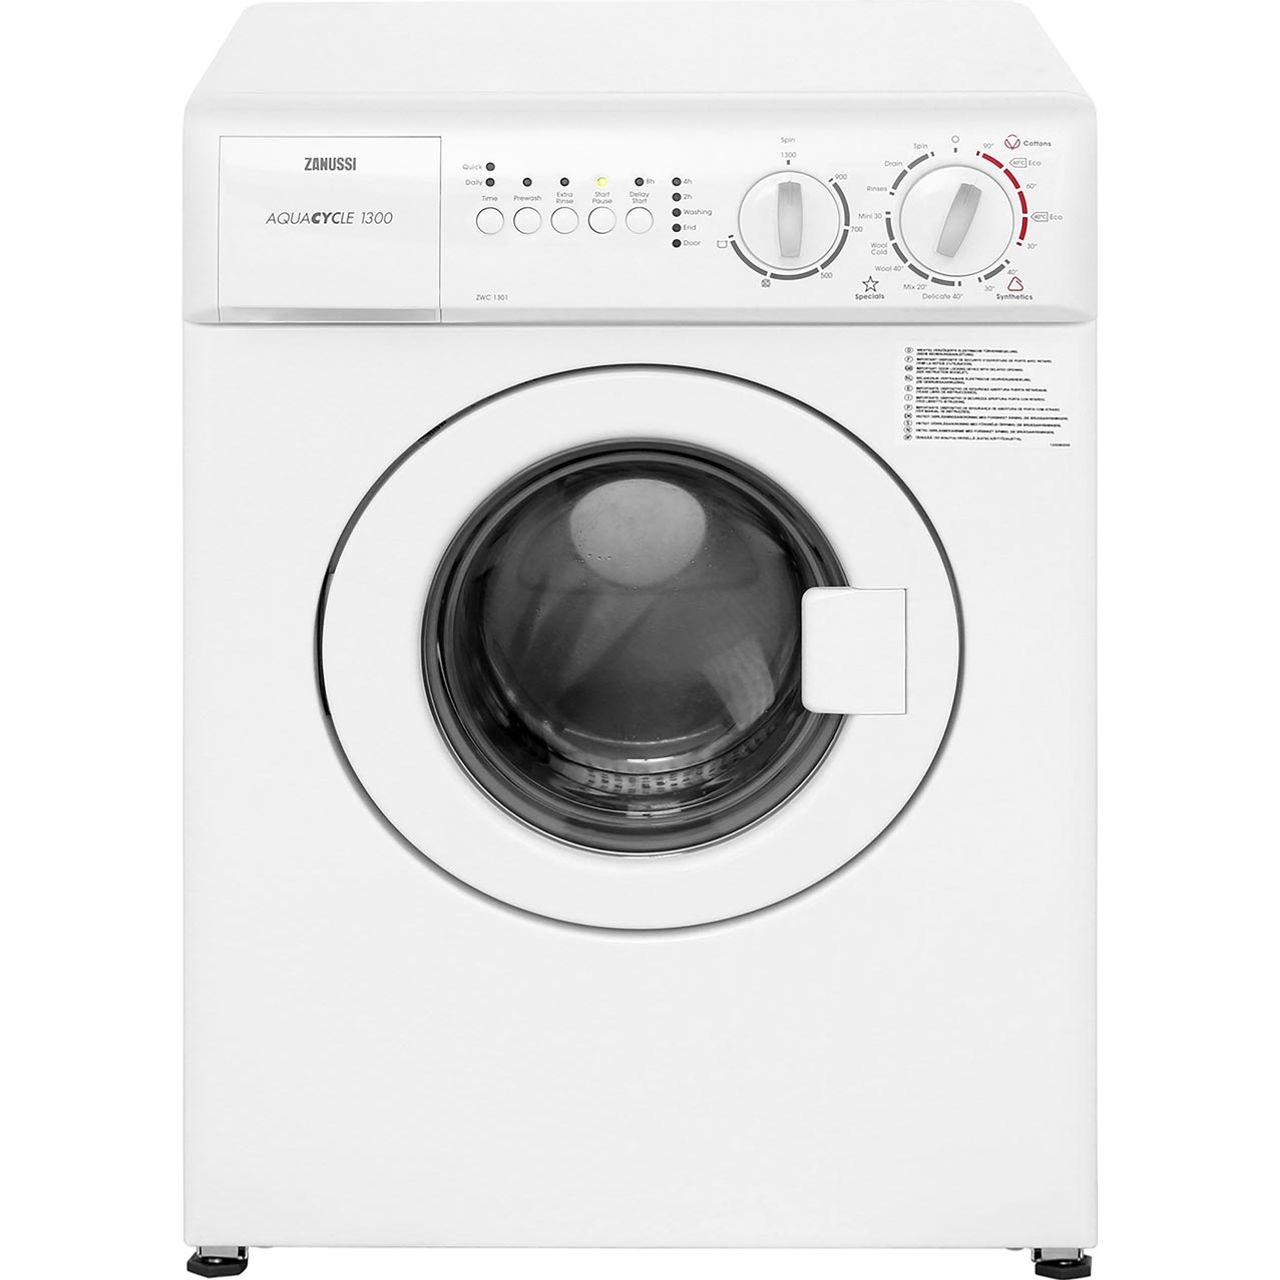 Standard Washing Machine Width Zanussi Zwc1301 3kg Washing Machine With 1300 Rpm White